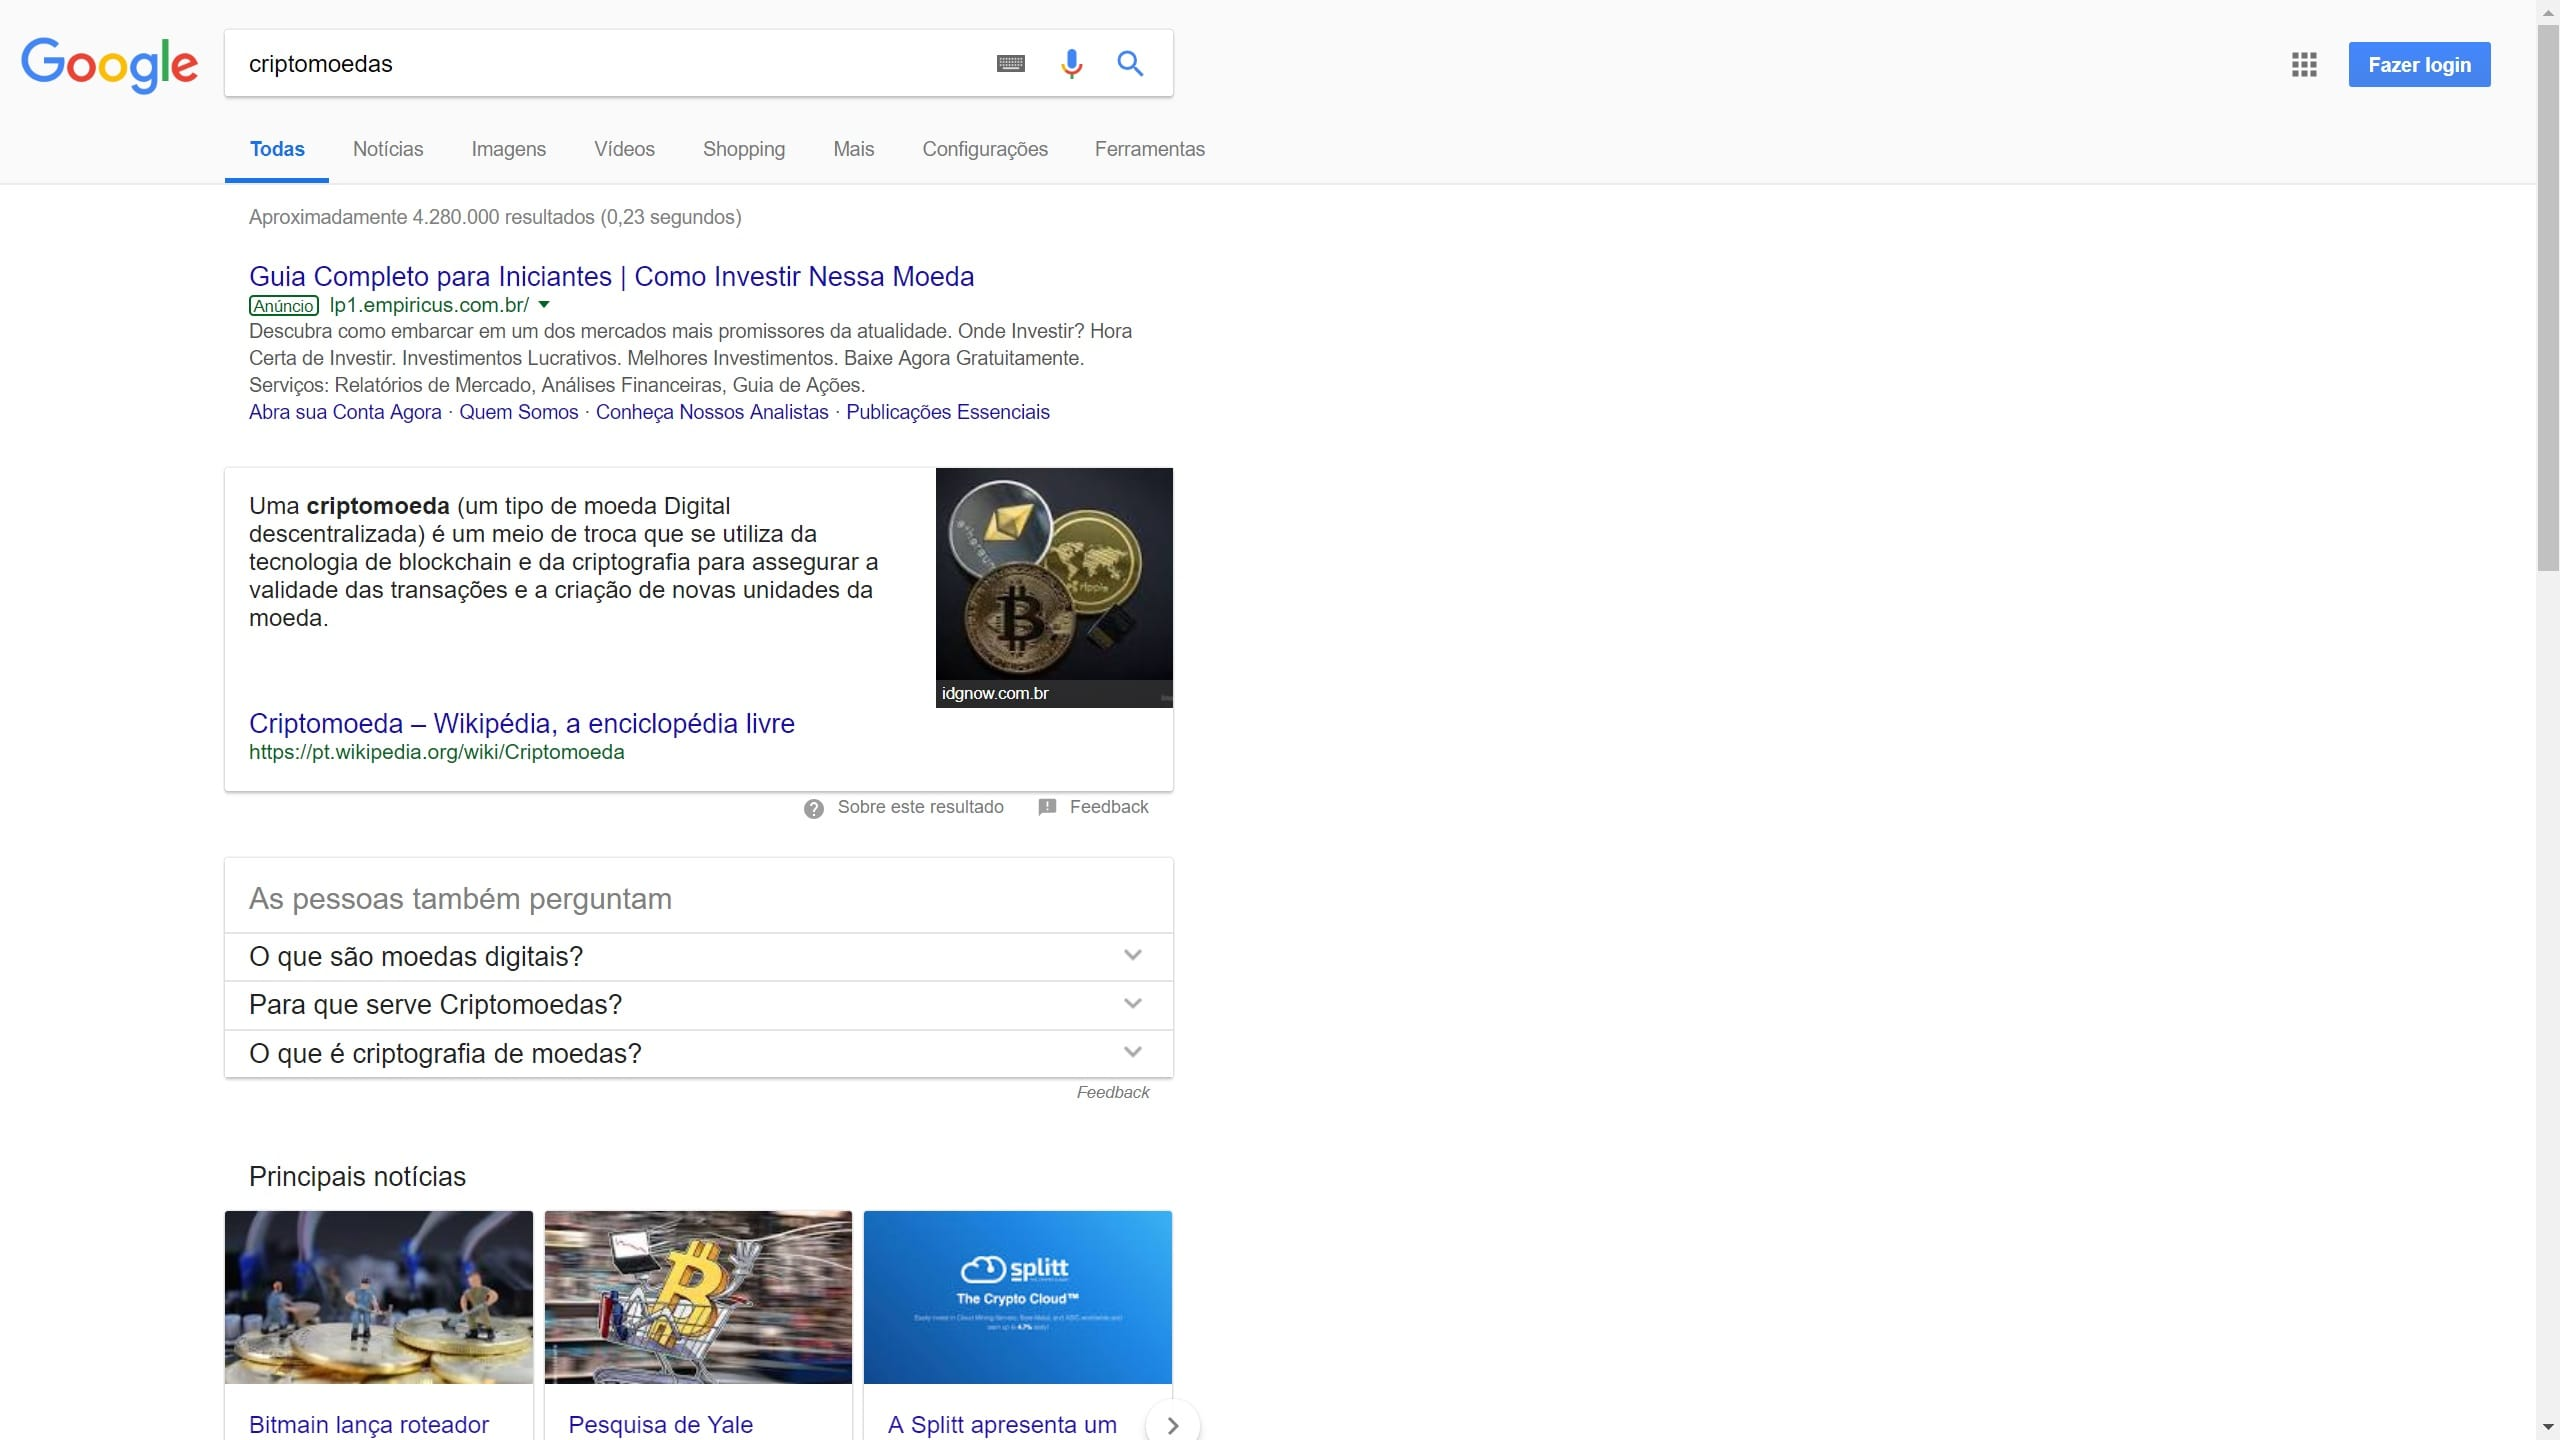 screenshot Google Search - Análise da concorrência